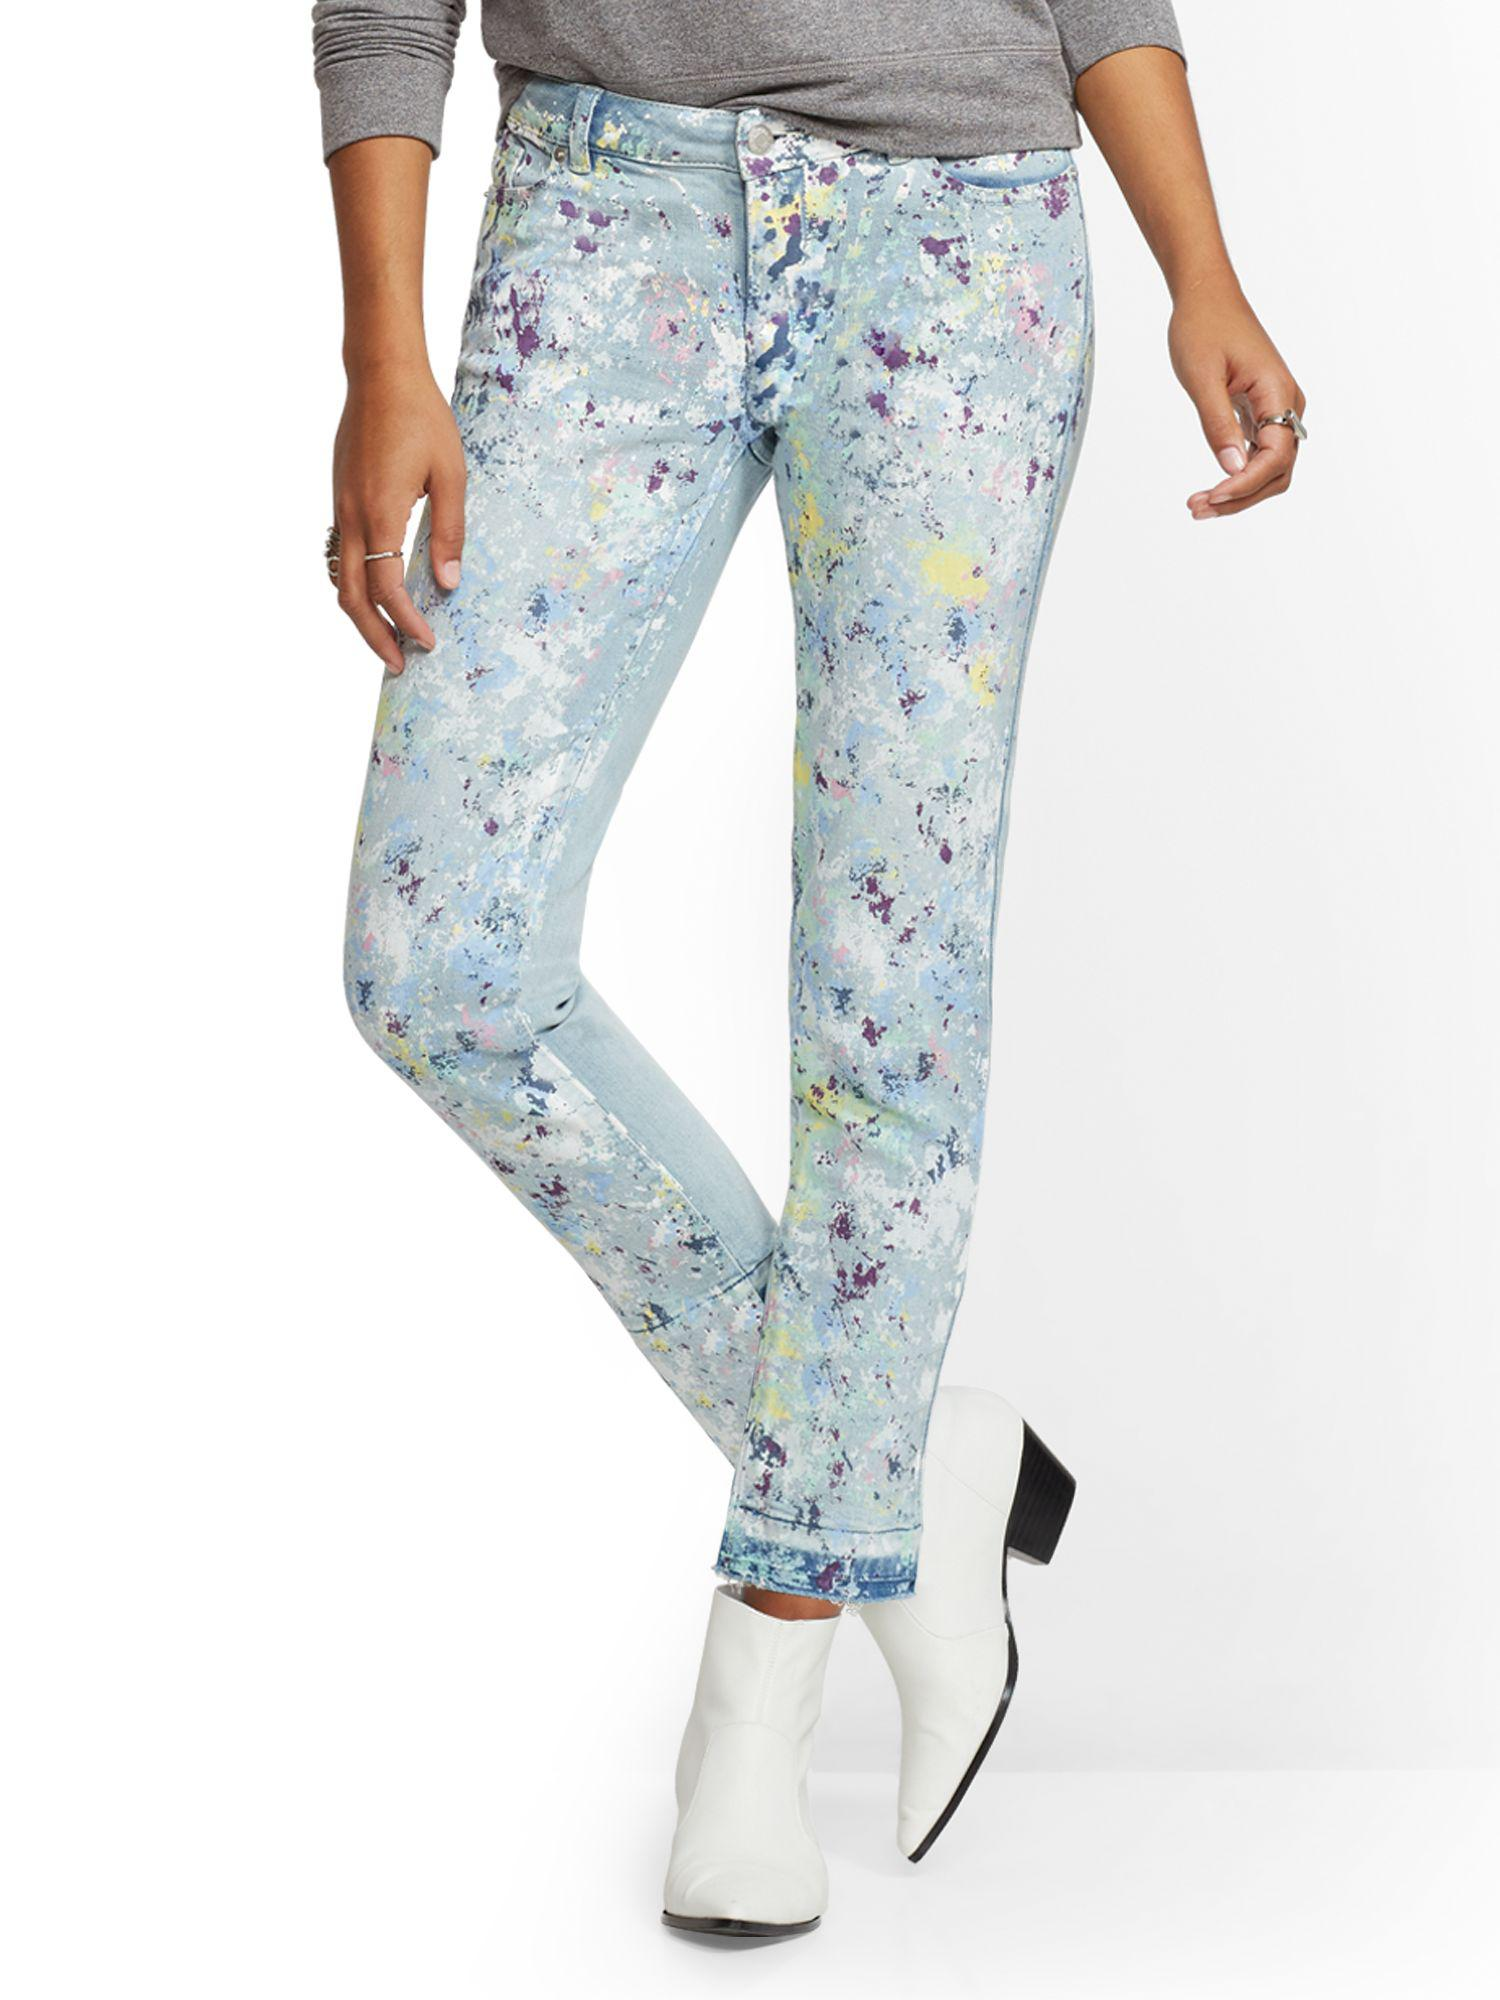 0a2c5eb48290 New York   Company. Women s Blue Soho Jeans - Paint-splattered Boyfriend  Jeans